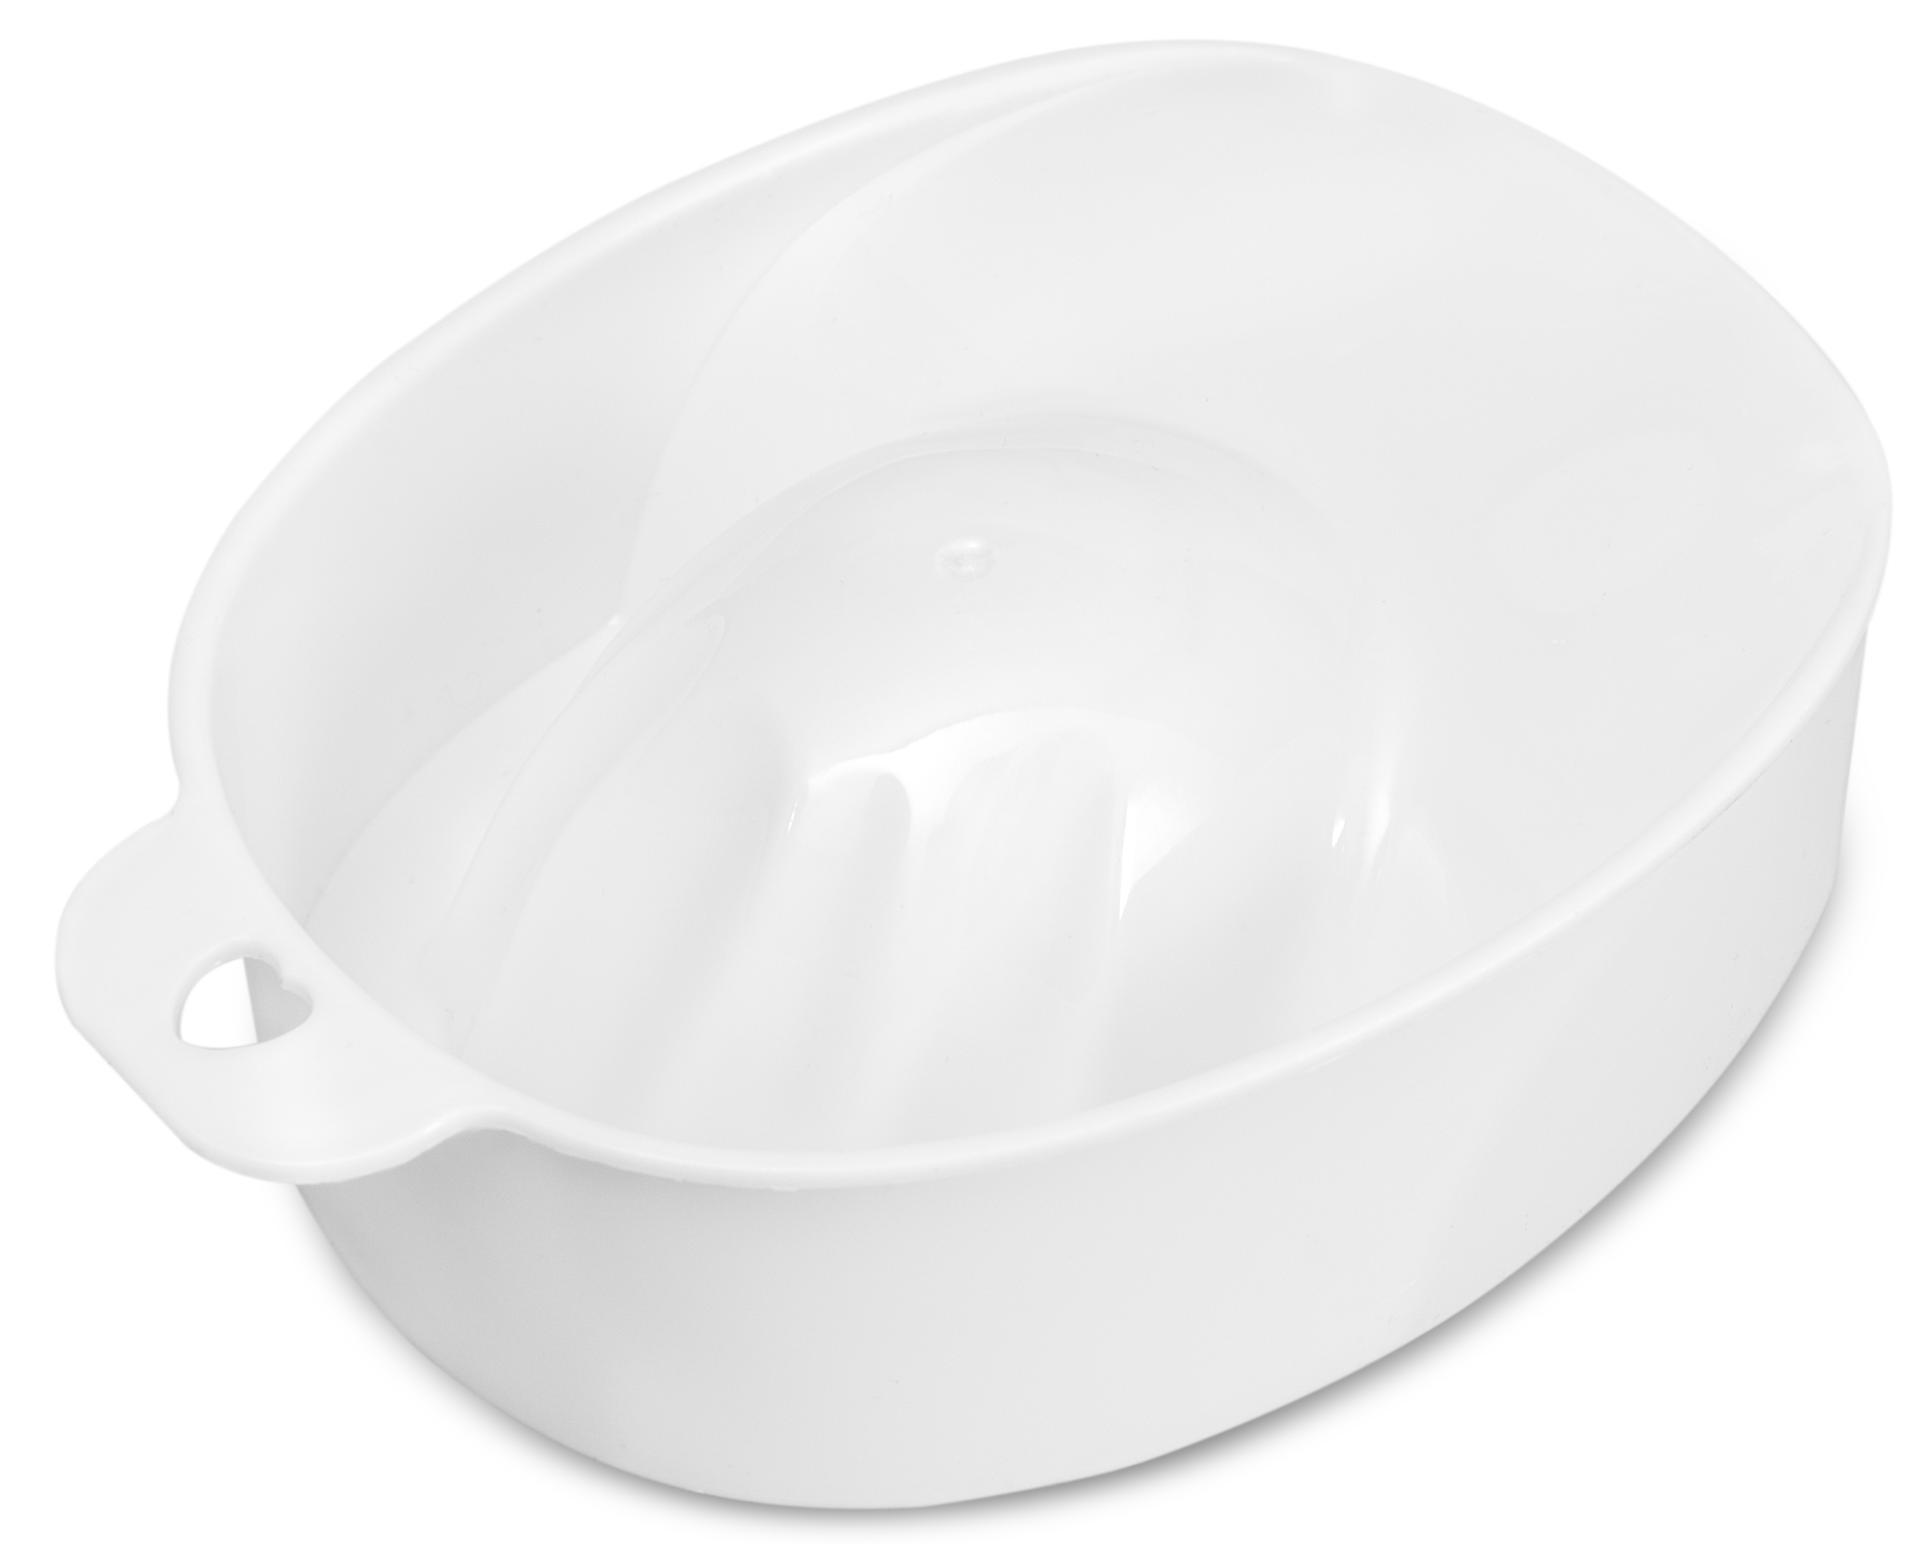 DOMIX Ванночка для маникюра, белая / DGP